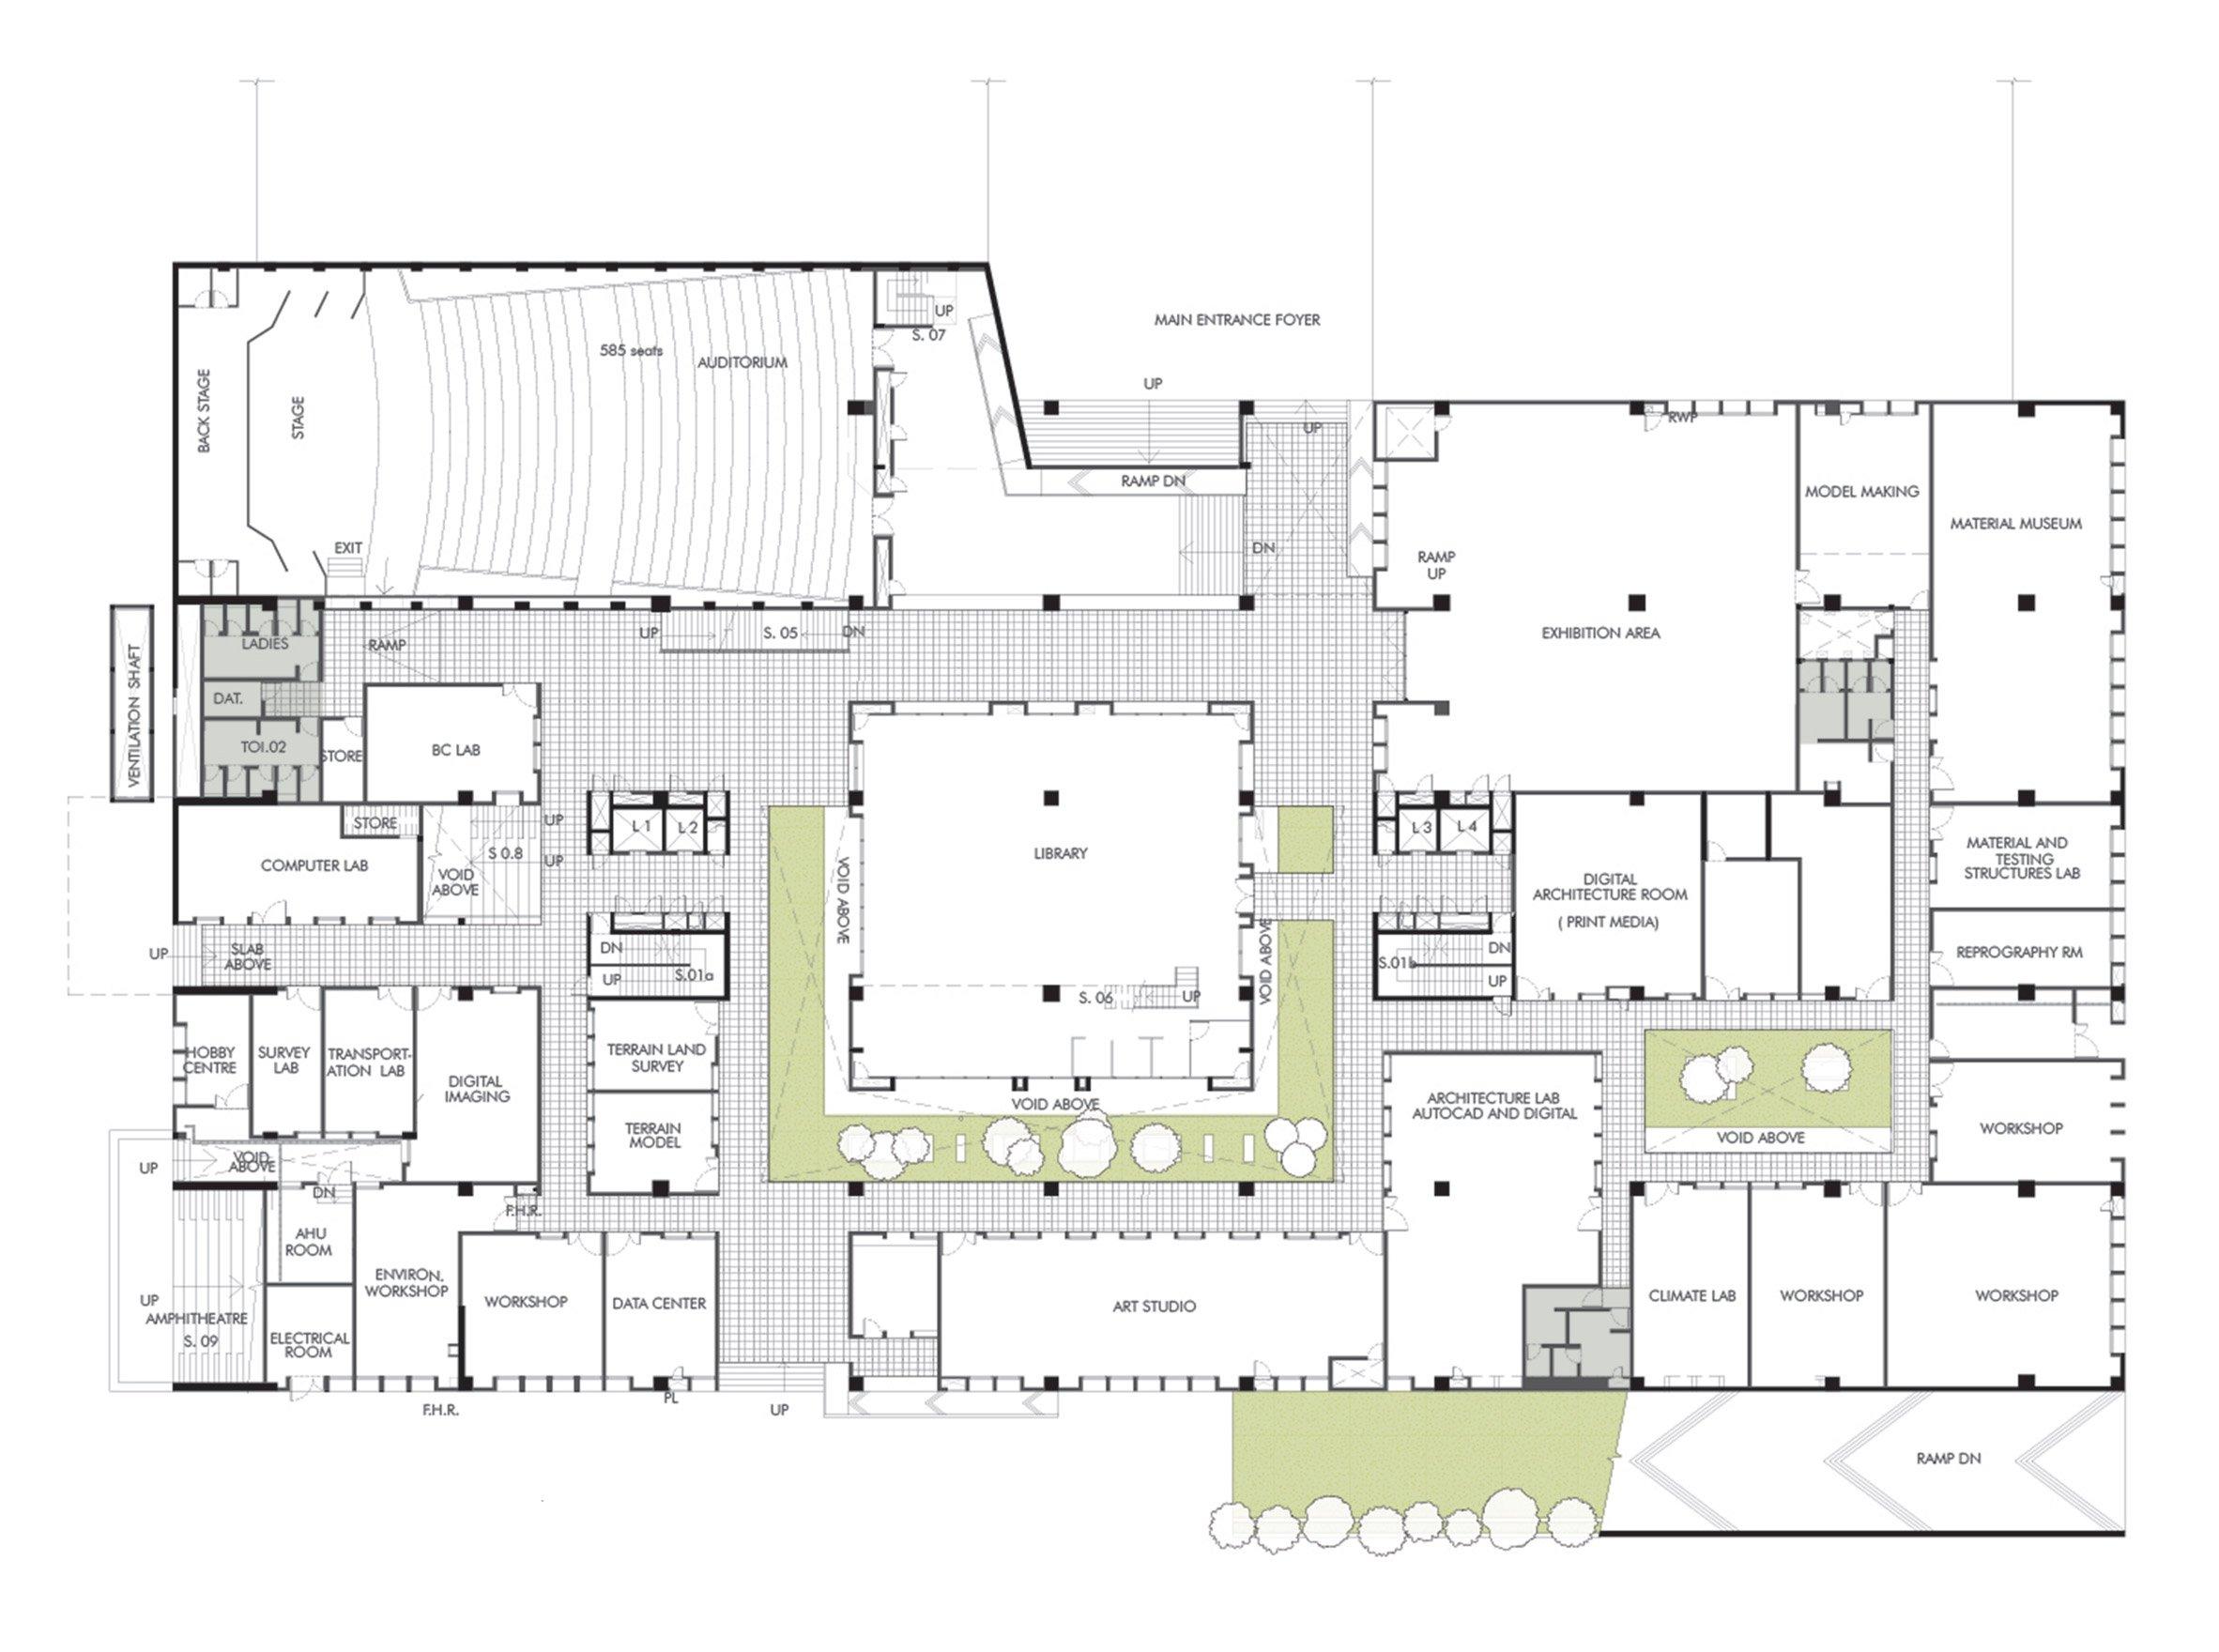 Mobile Offices Designs Brutalist Concrete Architecture School In India